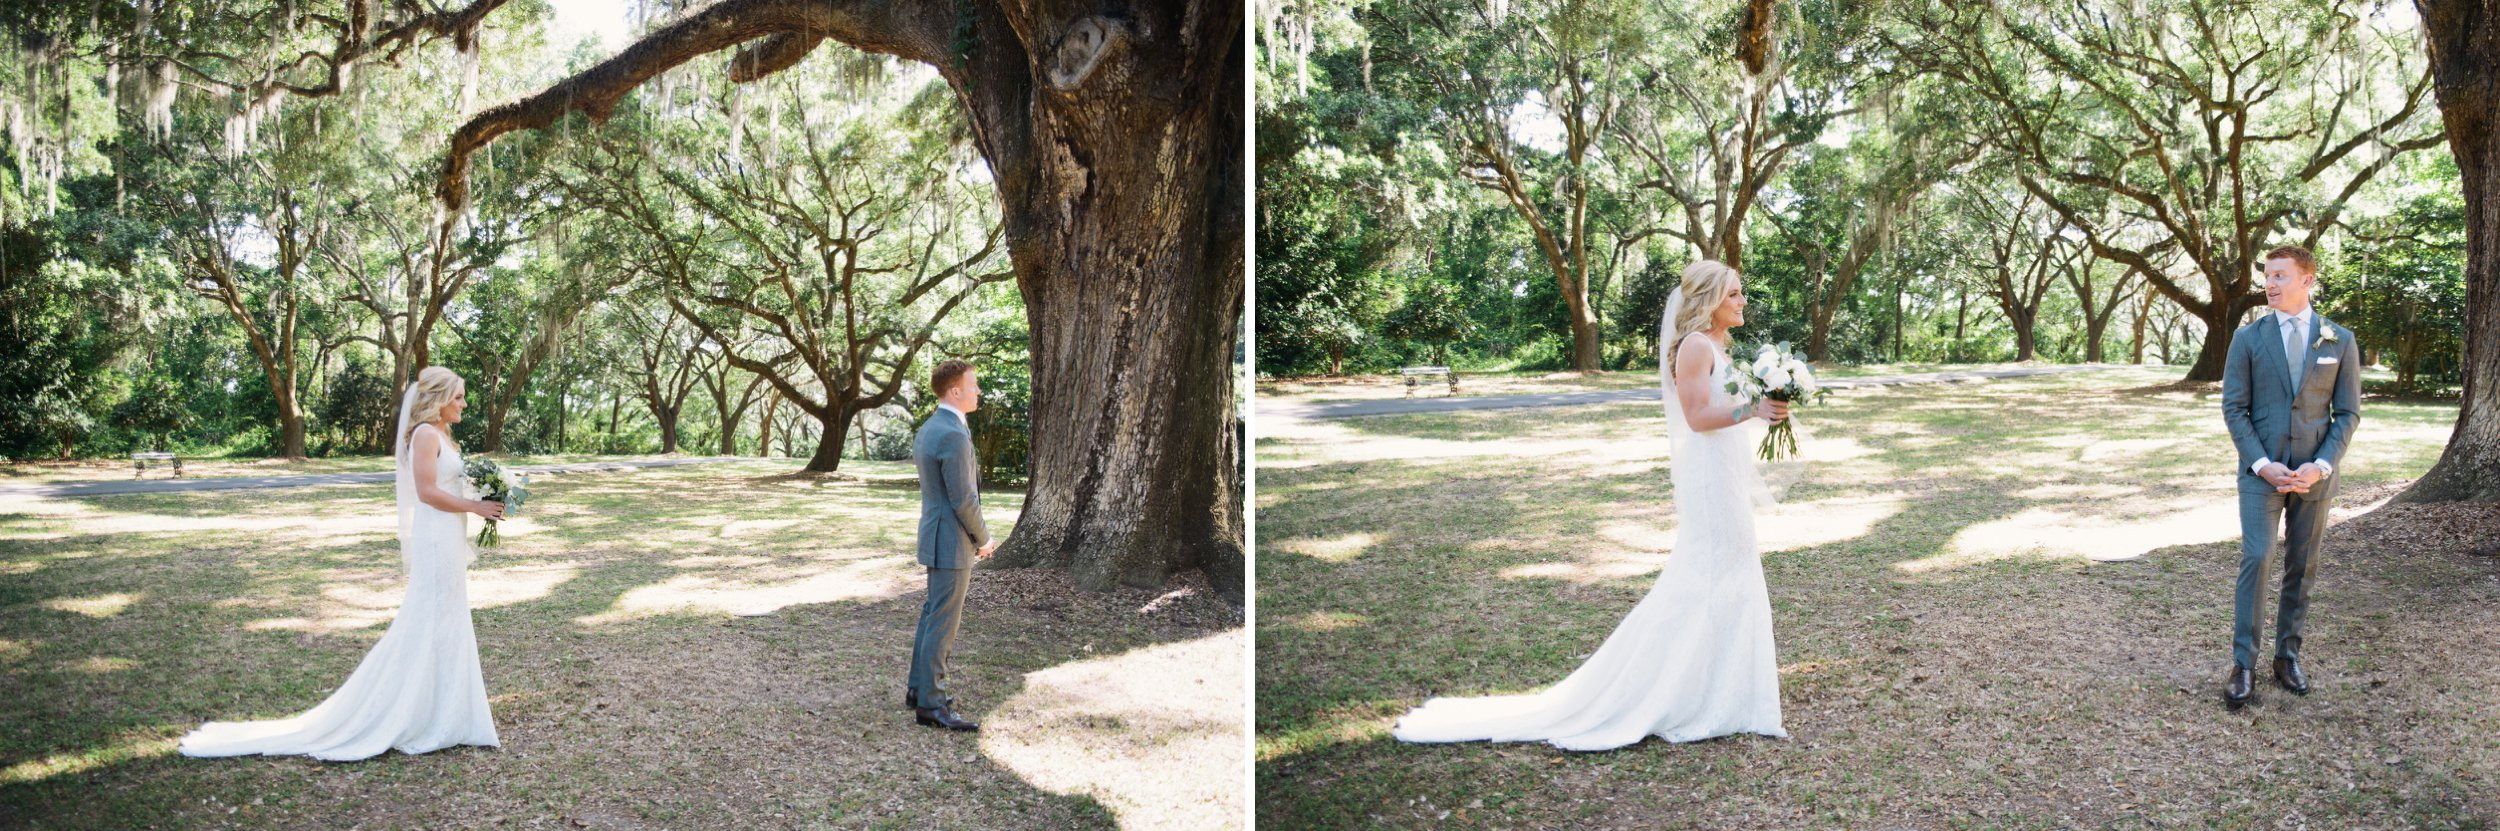 legare-waring-house-wedding-9.jpg